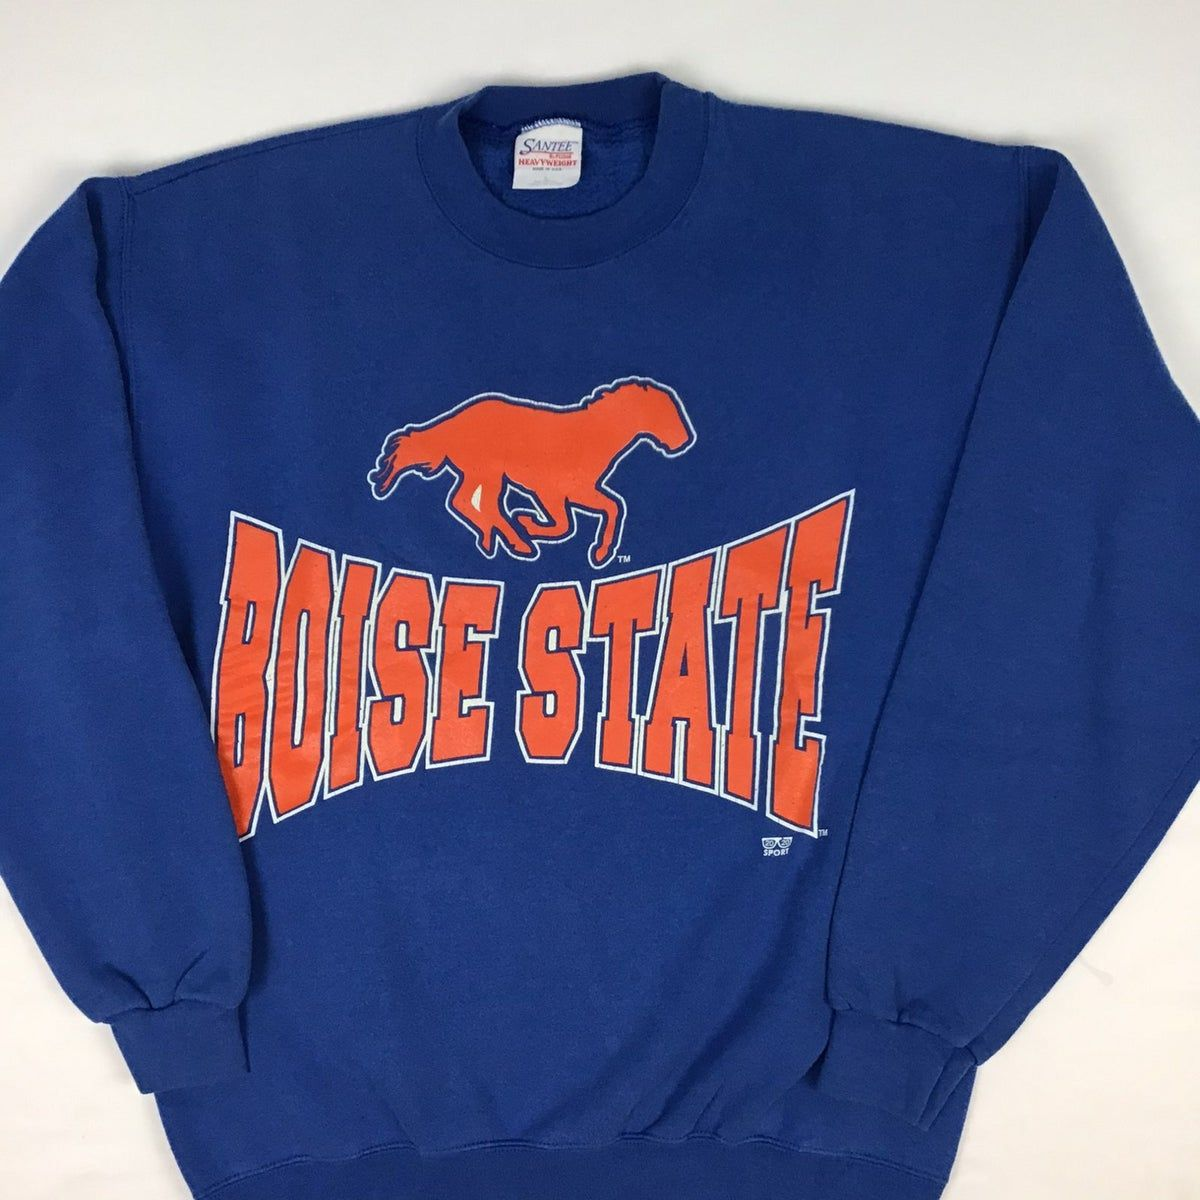 Vtg Boise State Broncos Crewneck On Mercari Sweatshirts Boise State Broncos Boise State [ 1200 x 1200 Pixel ]